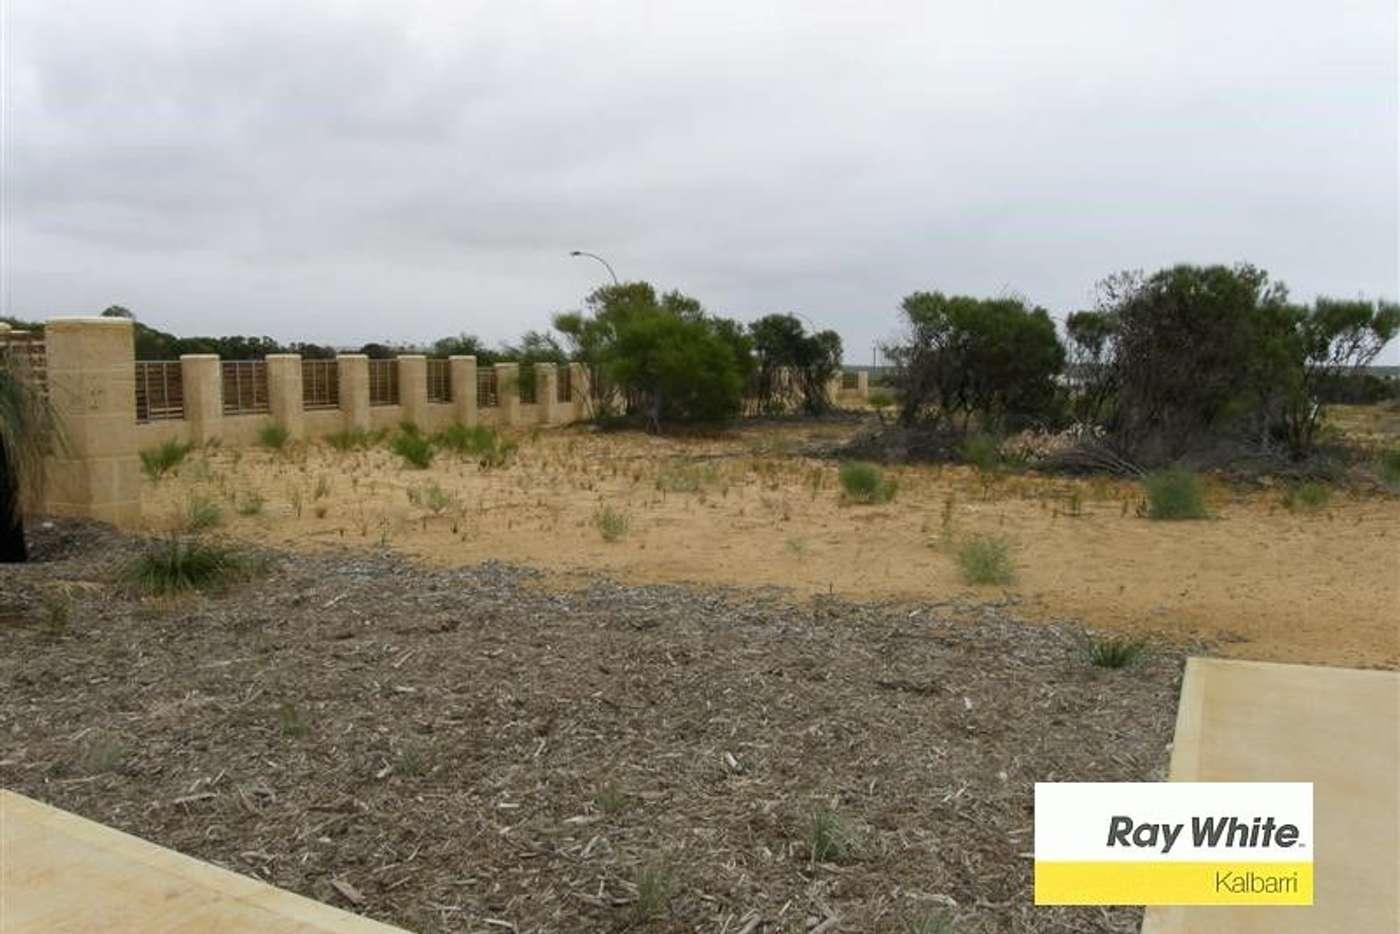 Main view of Homely residentialLand listing, 64 Lot 20 Walker Street, Kalbarri WA 6536